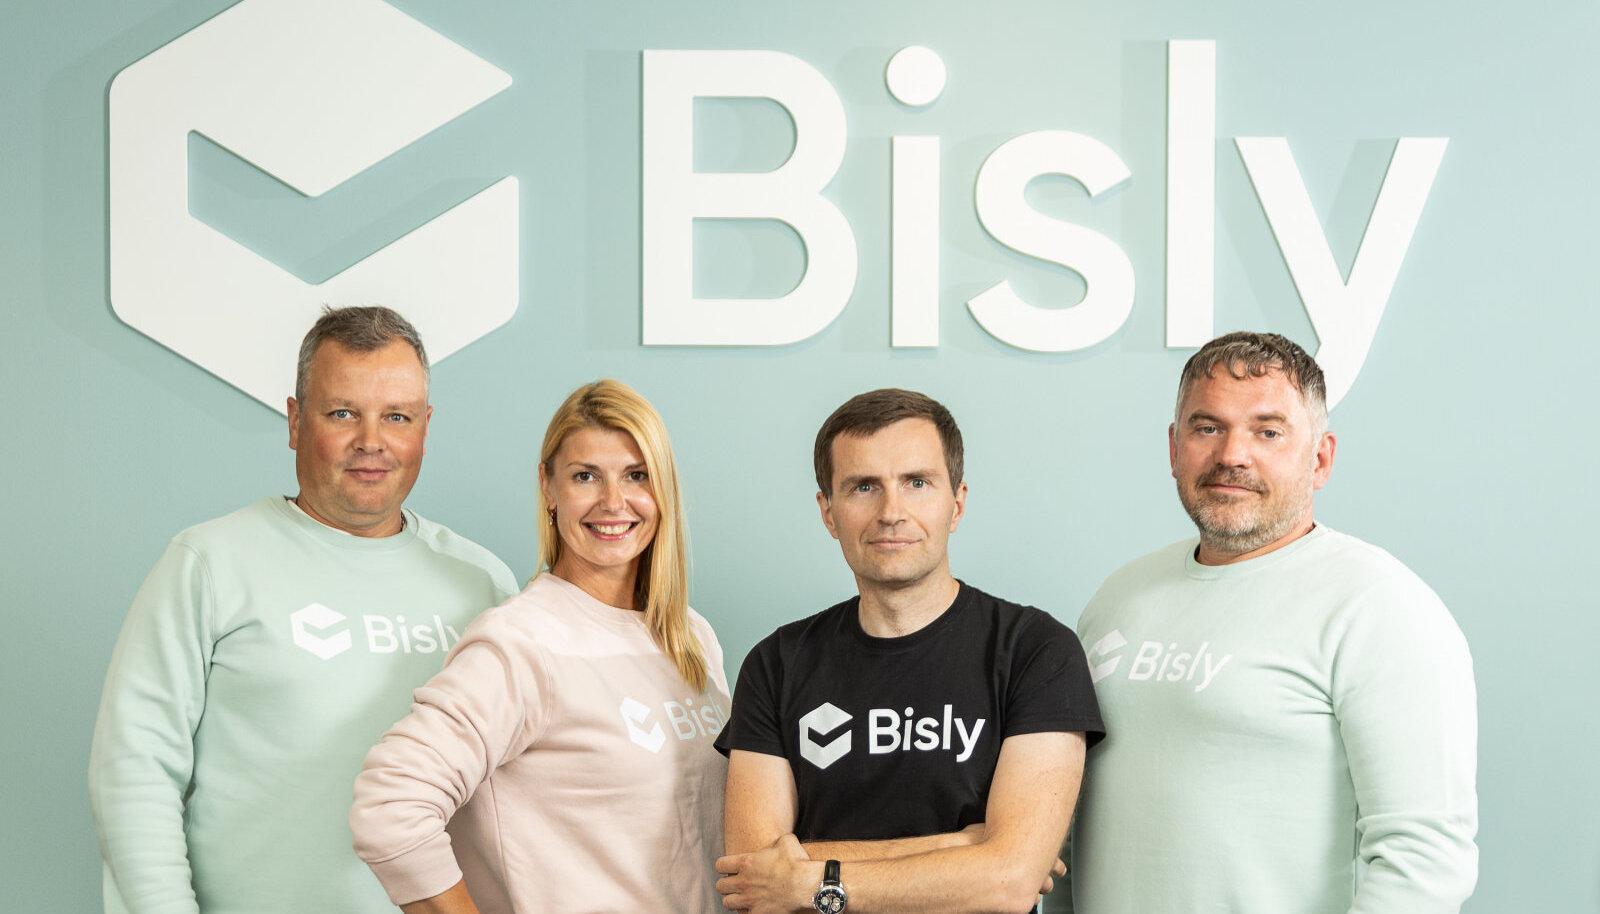 Bisly